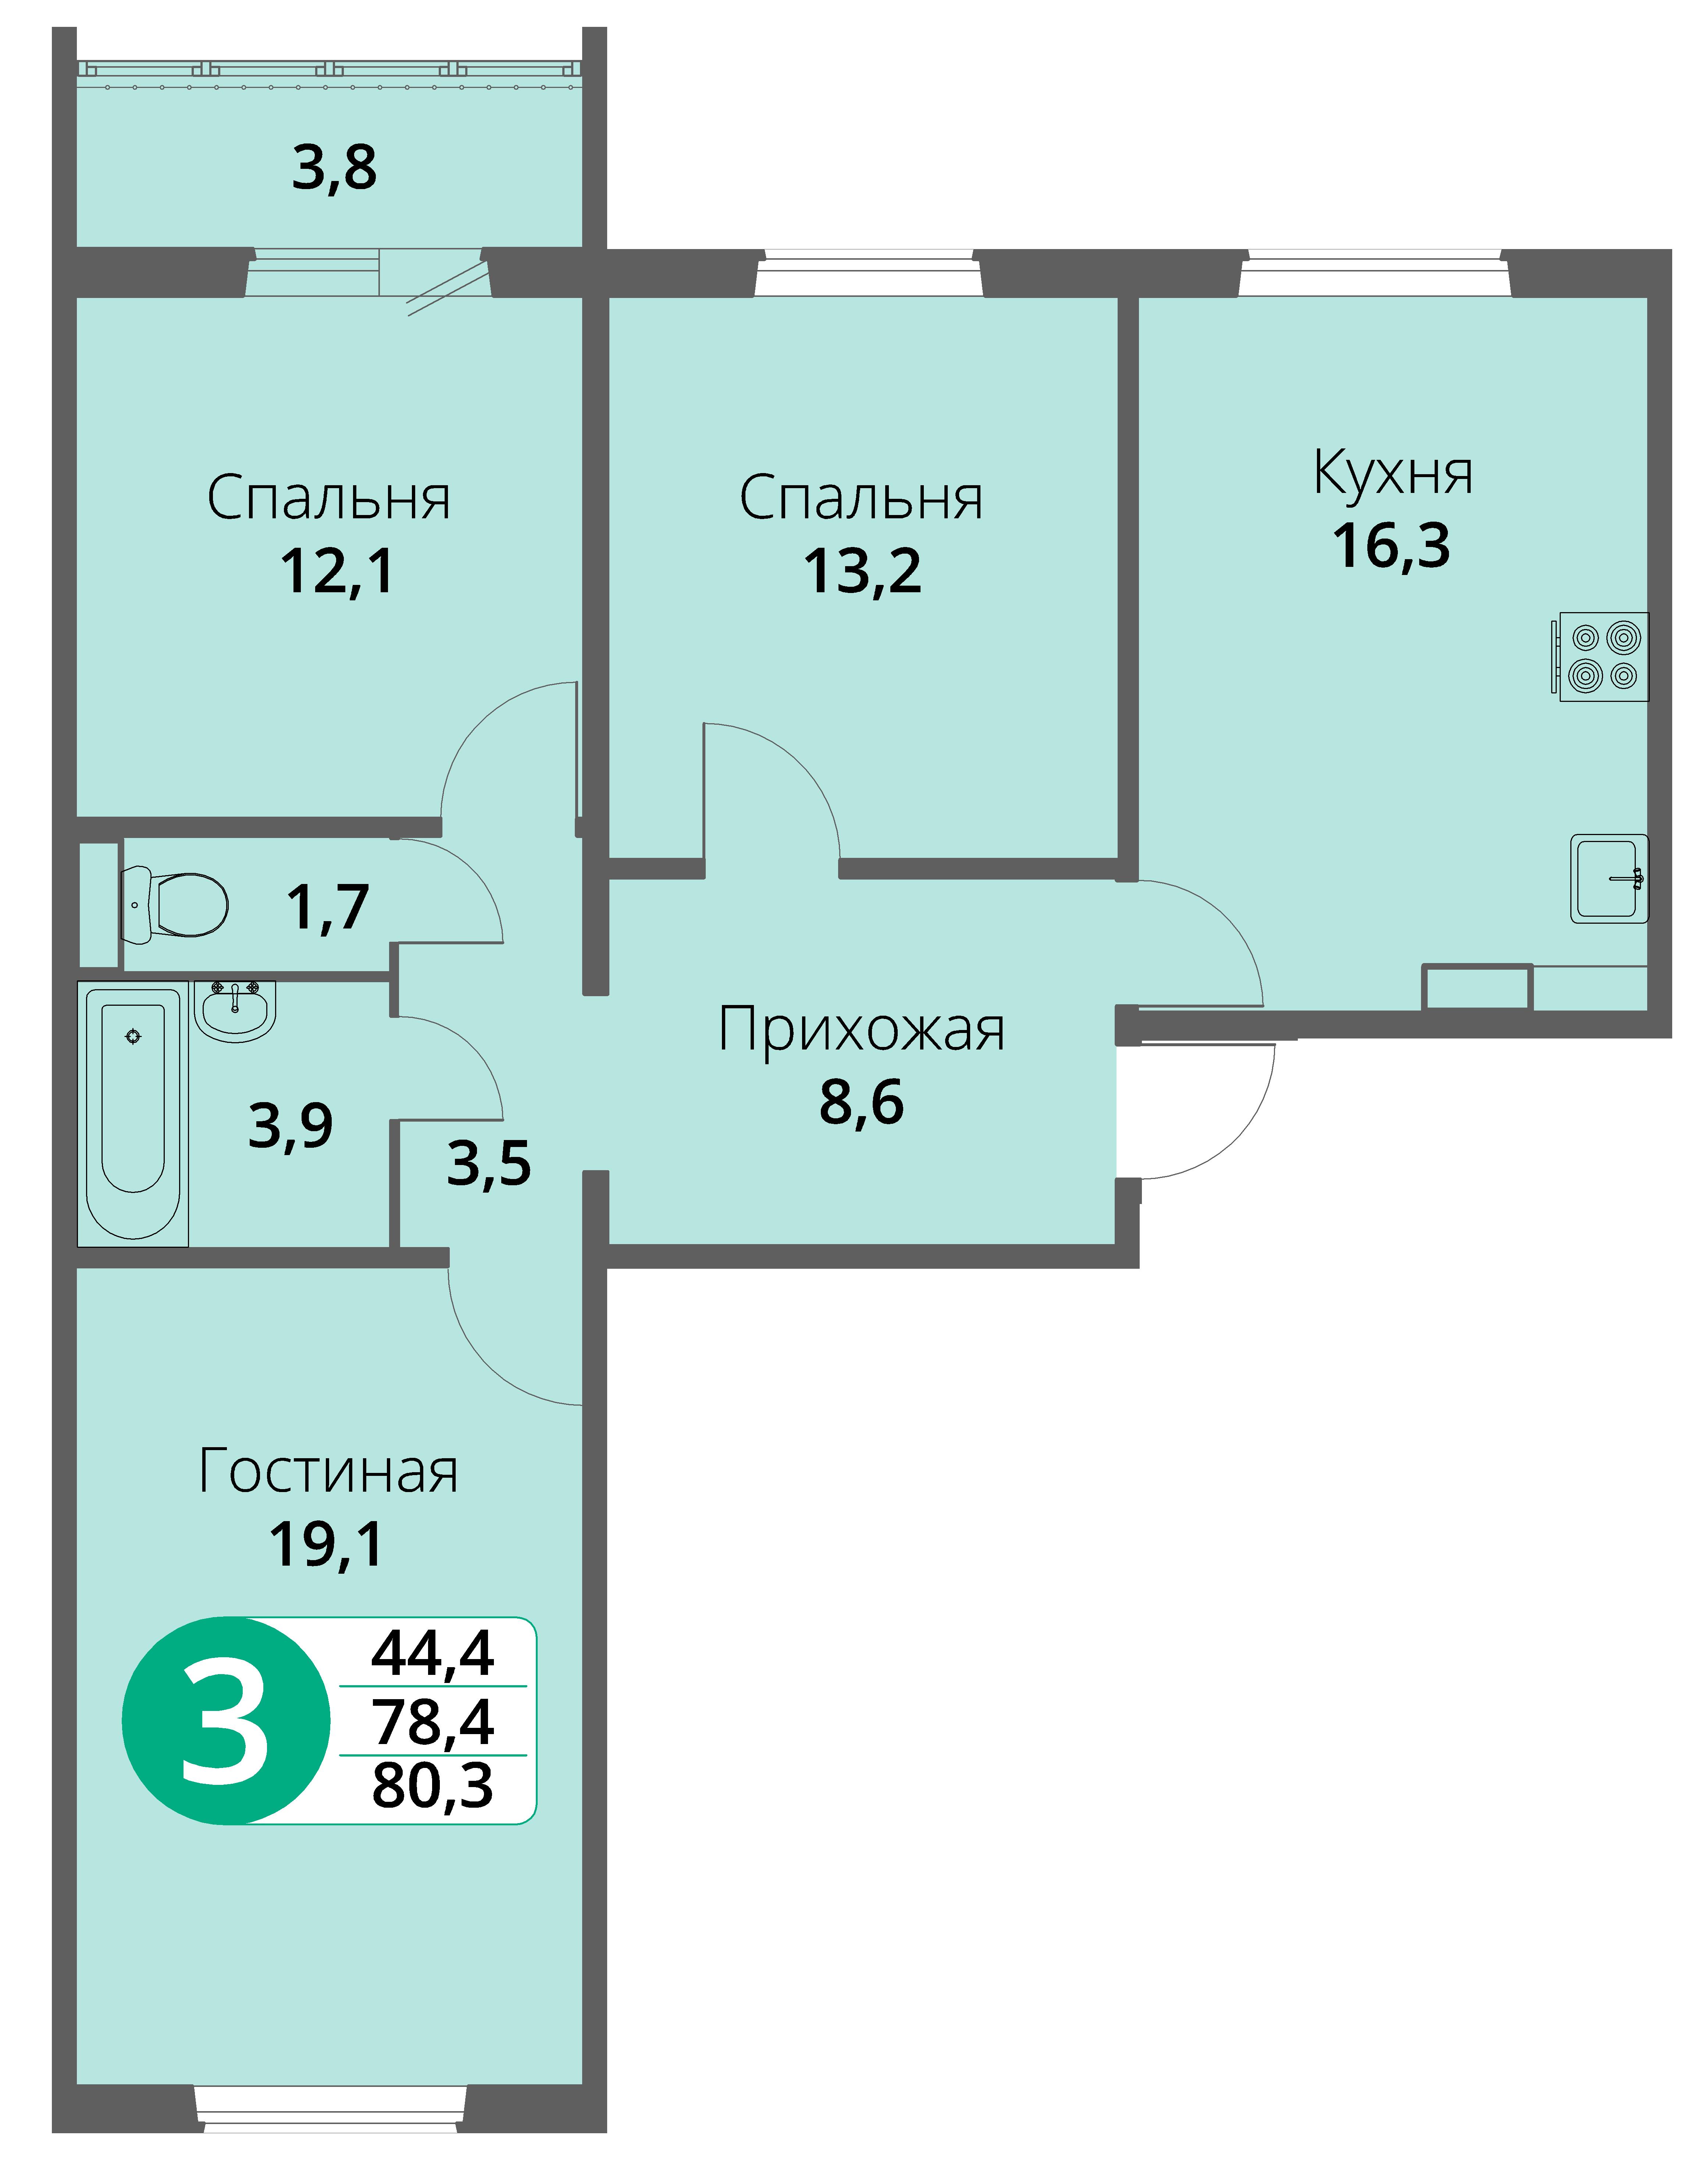 Зареченская 1-2, квартира 155 - Трехкомнатная